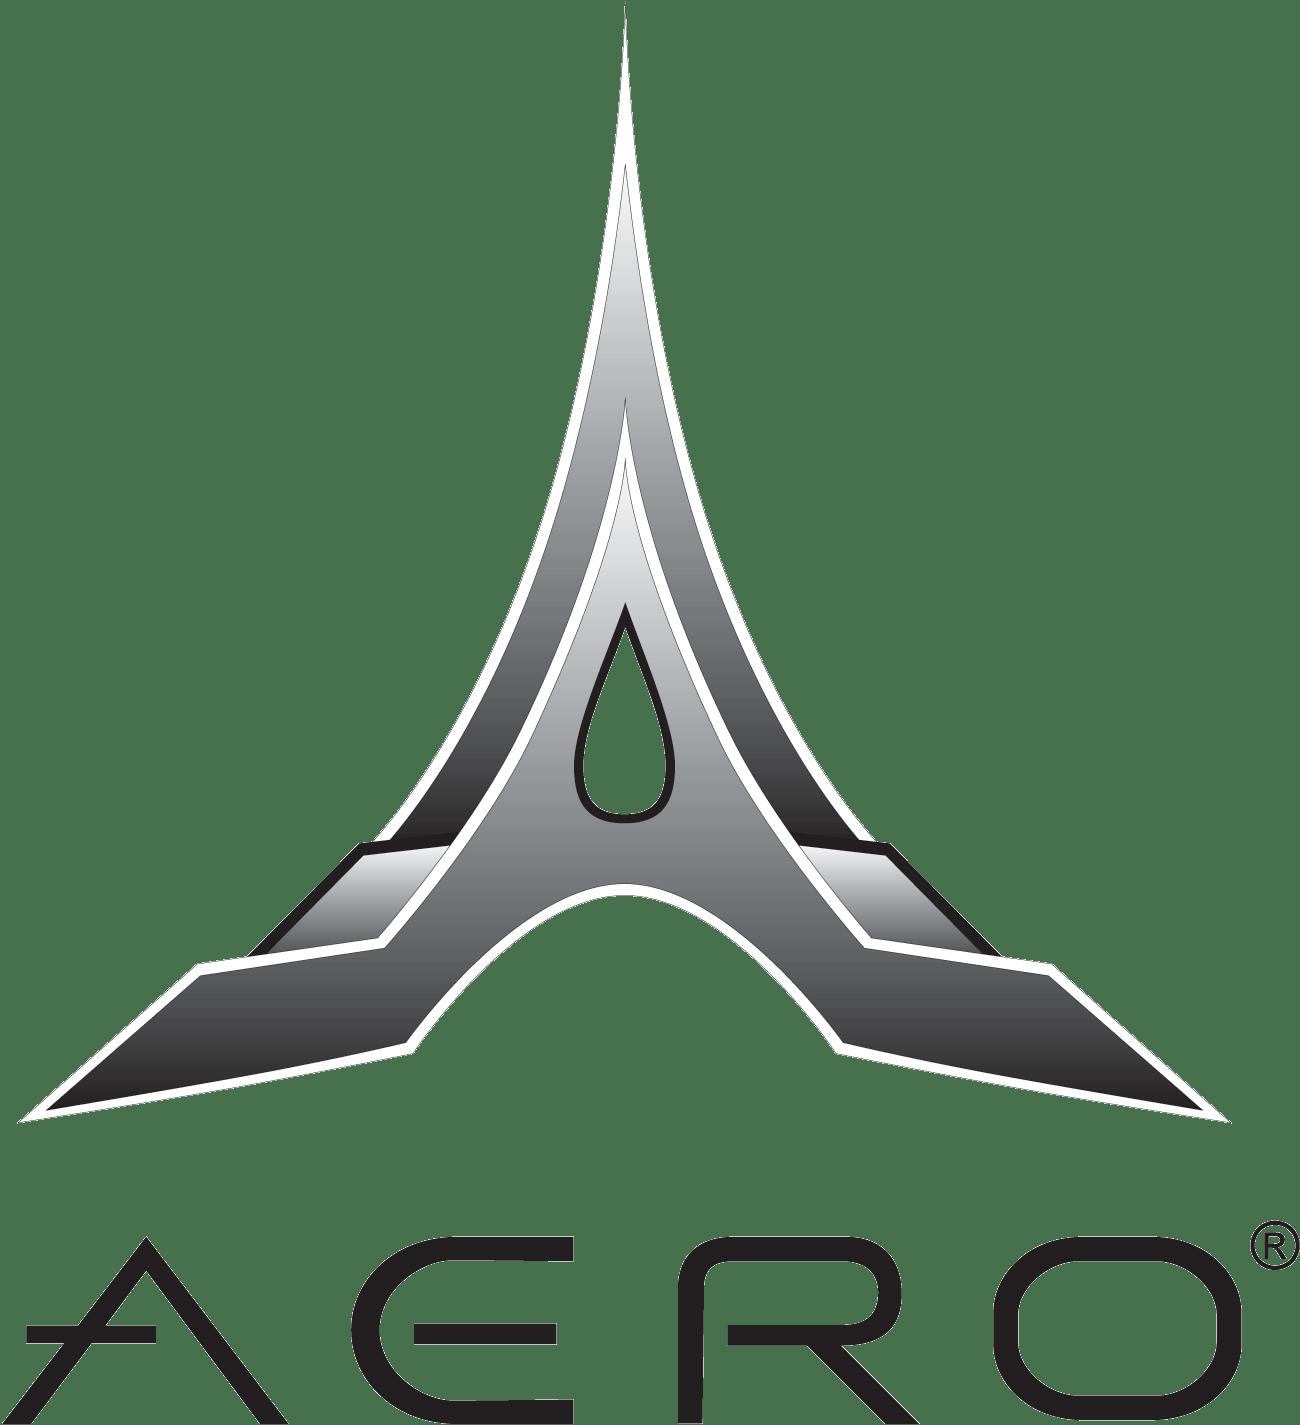 Aero-Products-shadedR-4x4_3